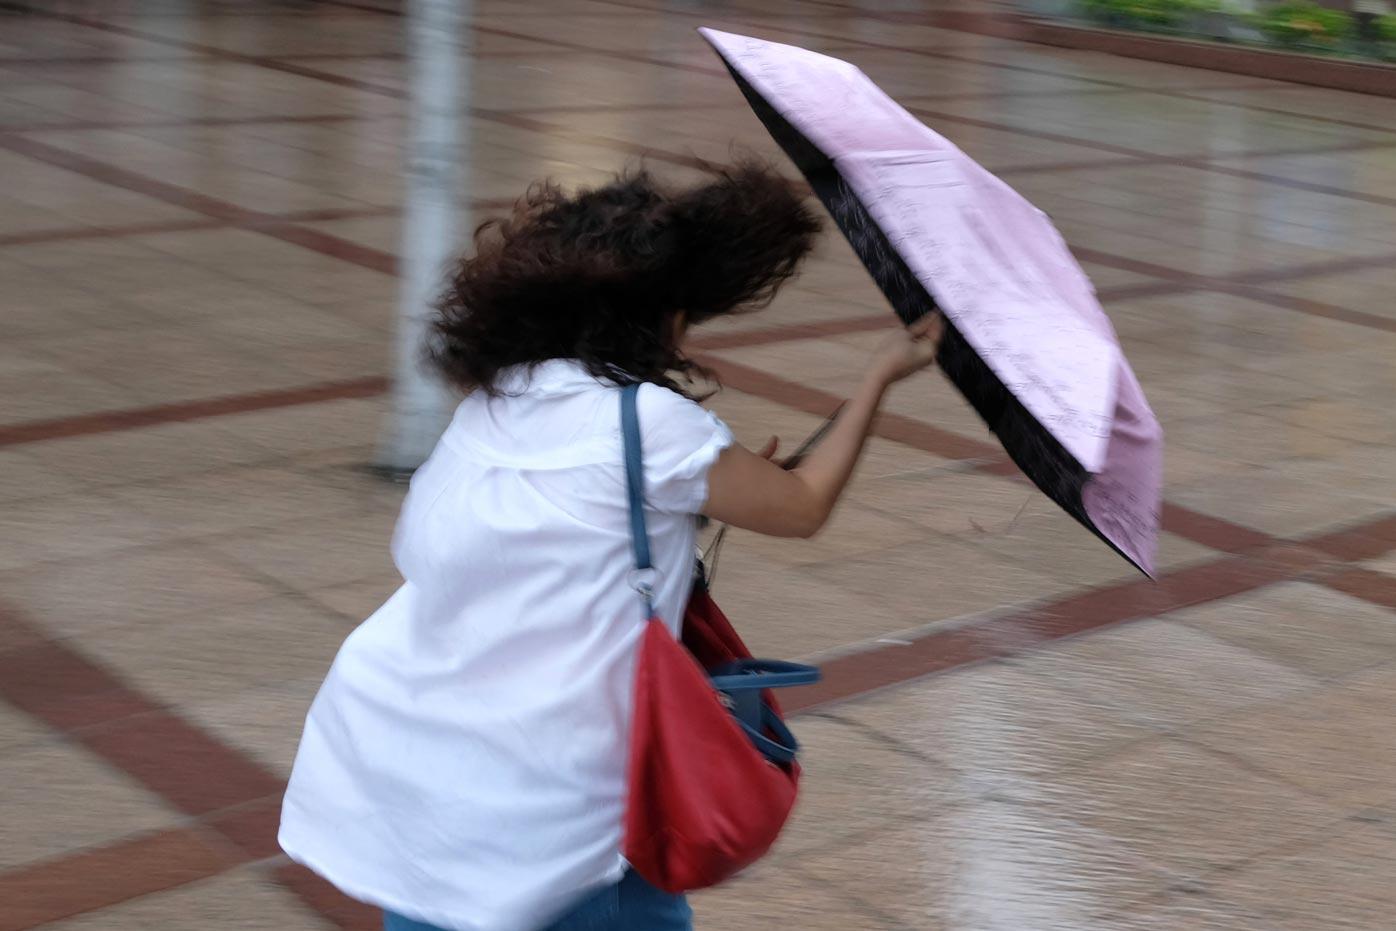 Typhoon Lekima makes landfall in China with 175kph winds